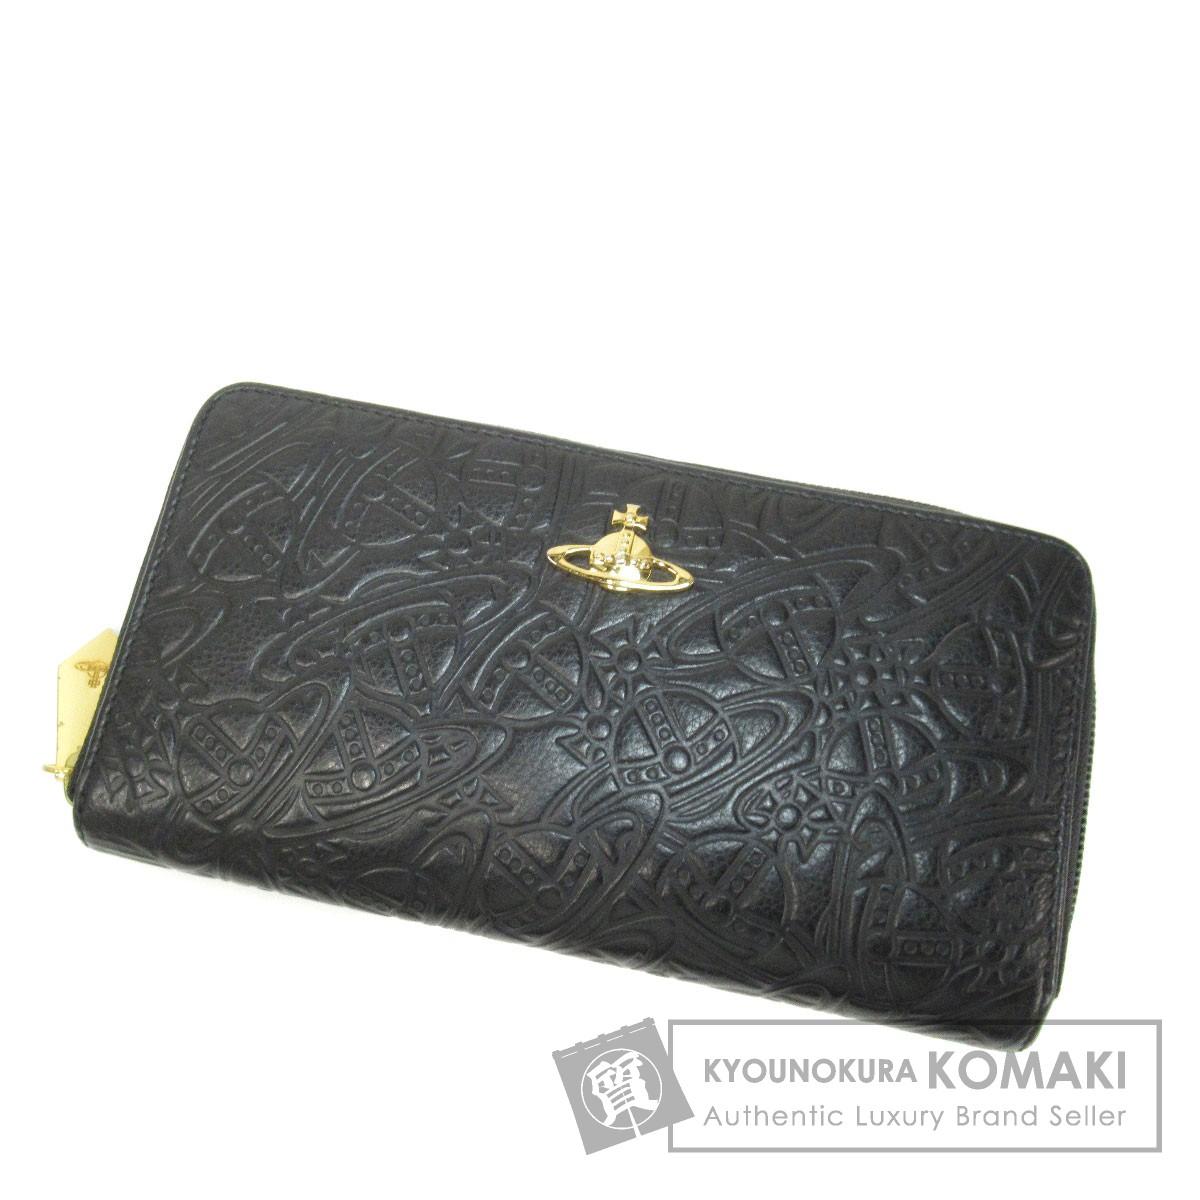 Vivienne Westwood ロゴモチーフ 長財布(小銭入れあり) レザー レディース 【中古】【ヴィヴィアンウエストウッド】